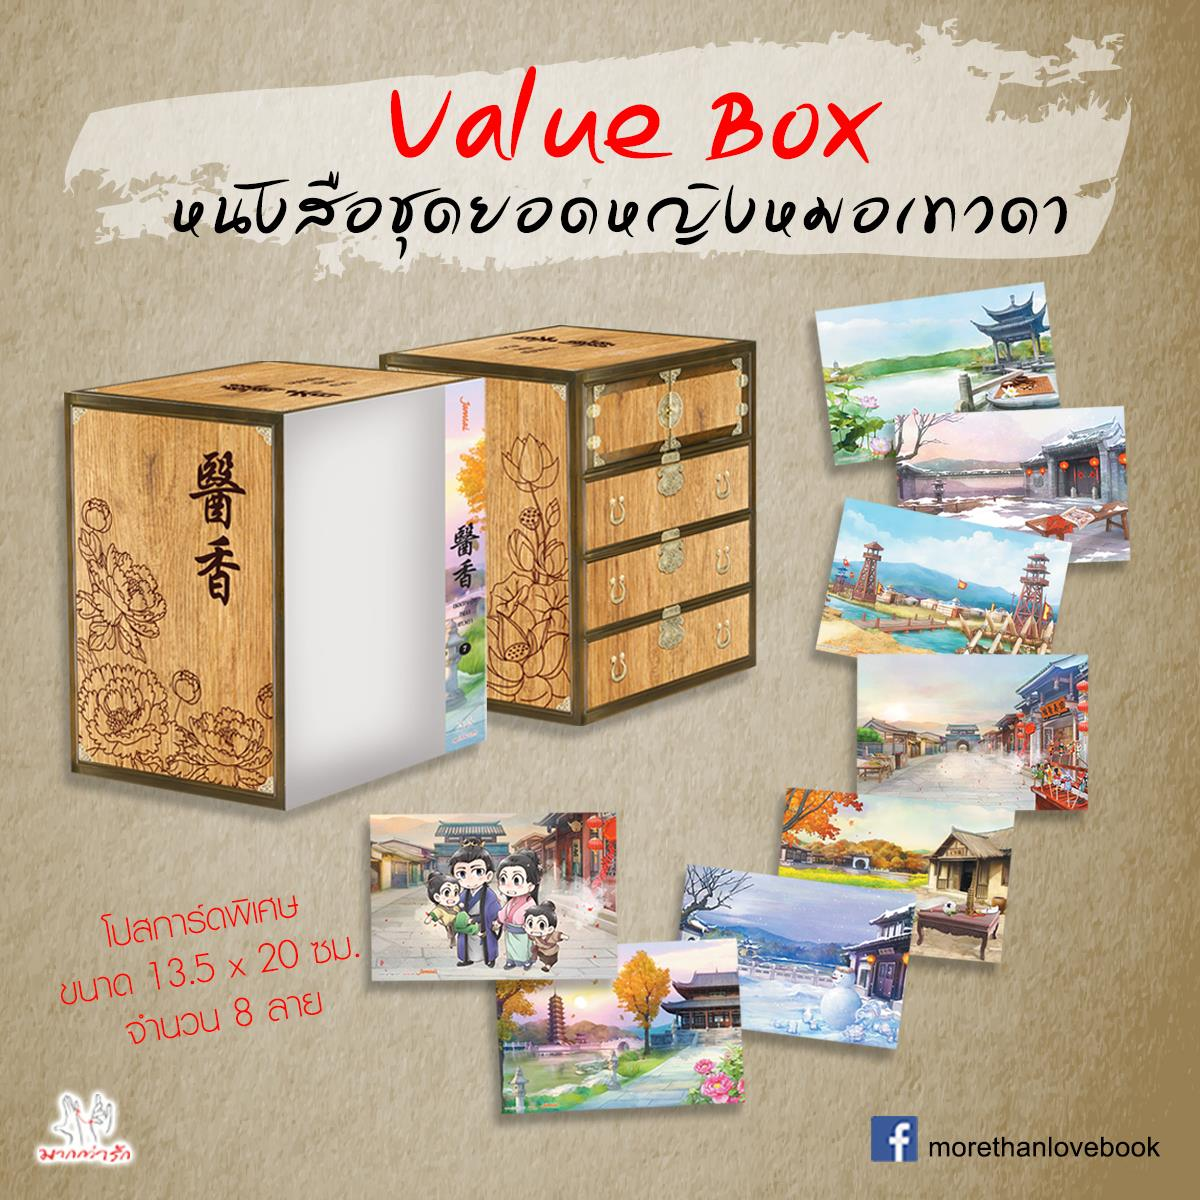 Value Box + ยอดหญิงหมอเทวดา เล่ม 7 (เล่มจบ ) : อวี่จิ่วฮวา